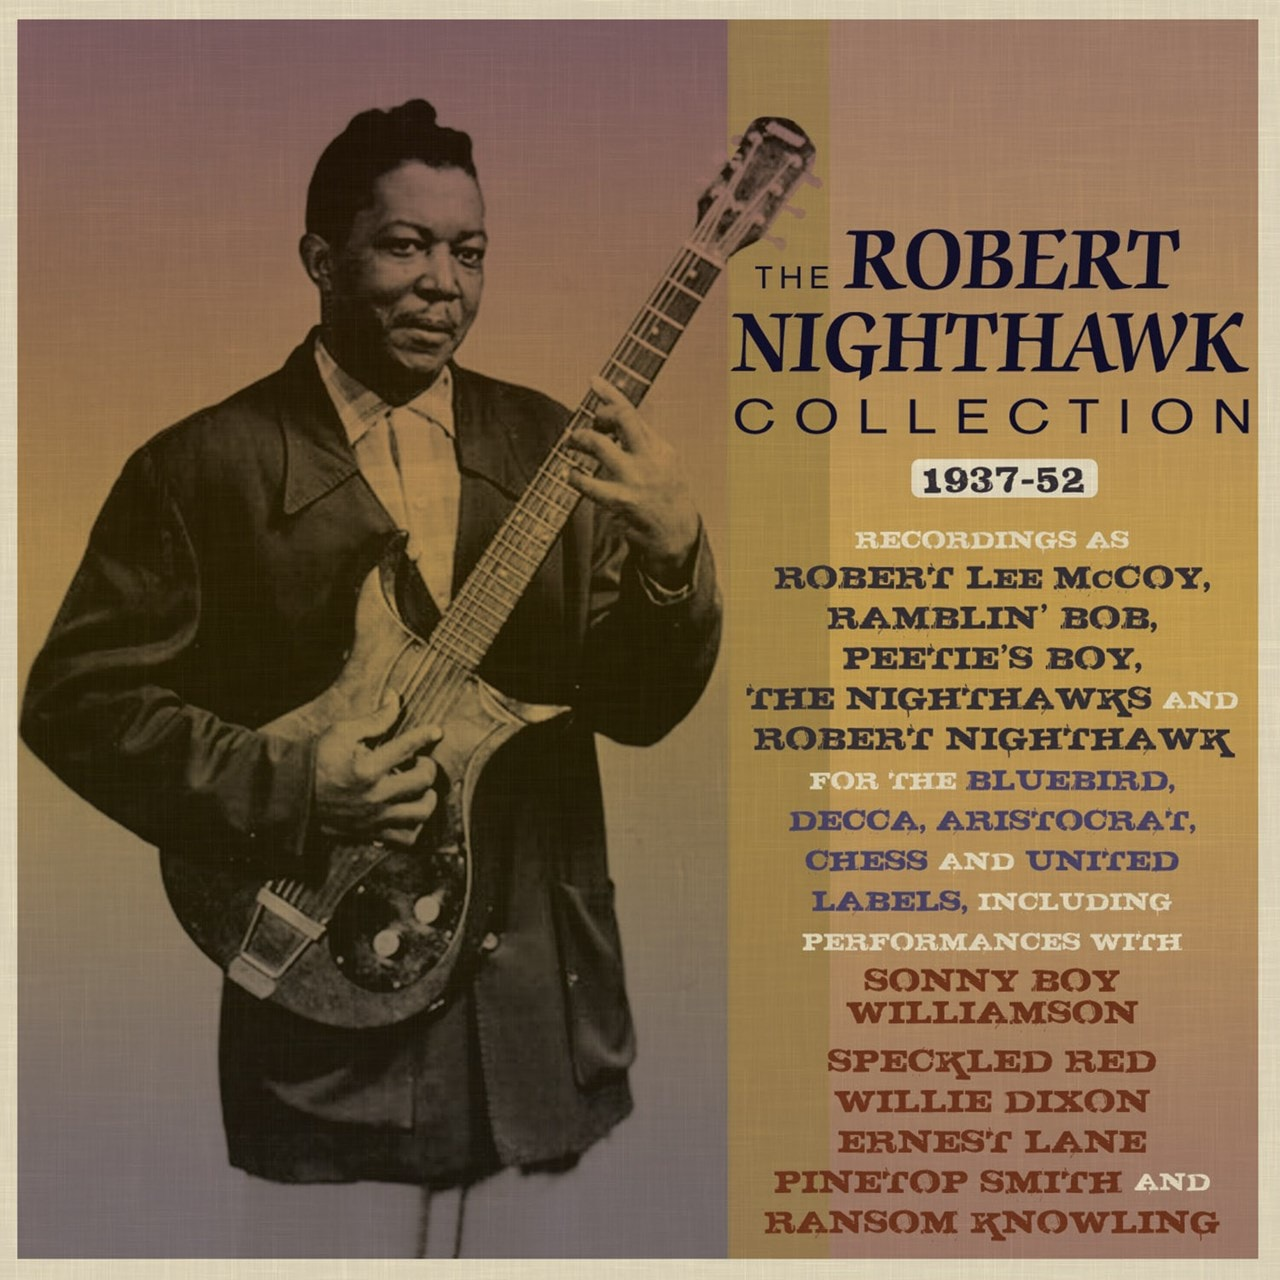 The Robert Nighthawk Collection 1937-52 - 1